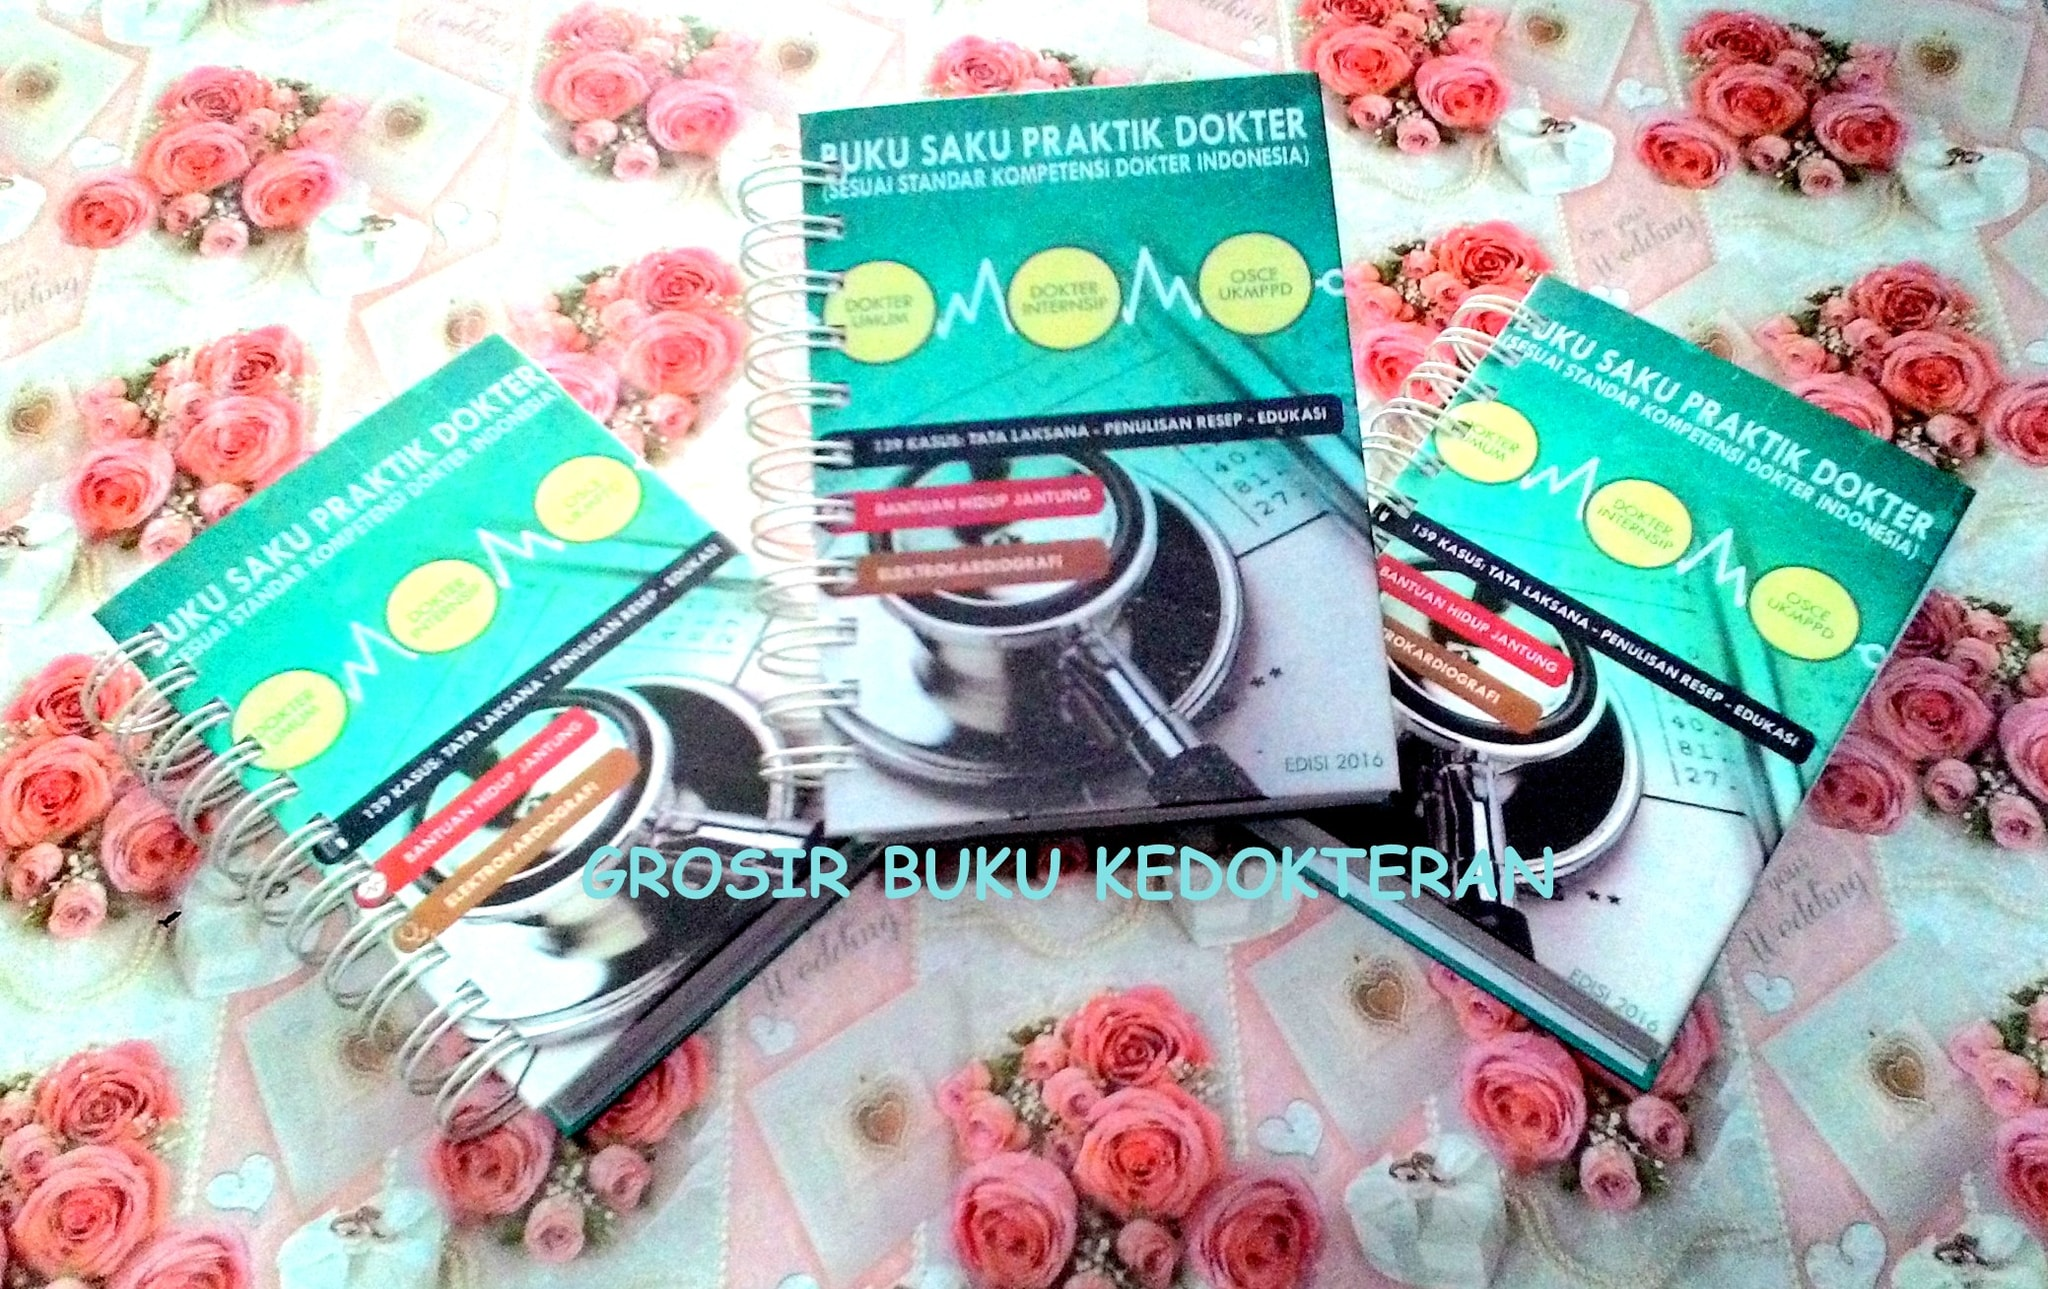 Buku Saku Praktik Dokter Revisi 2016